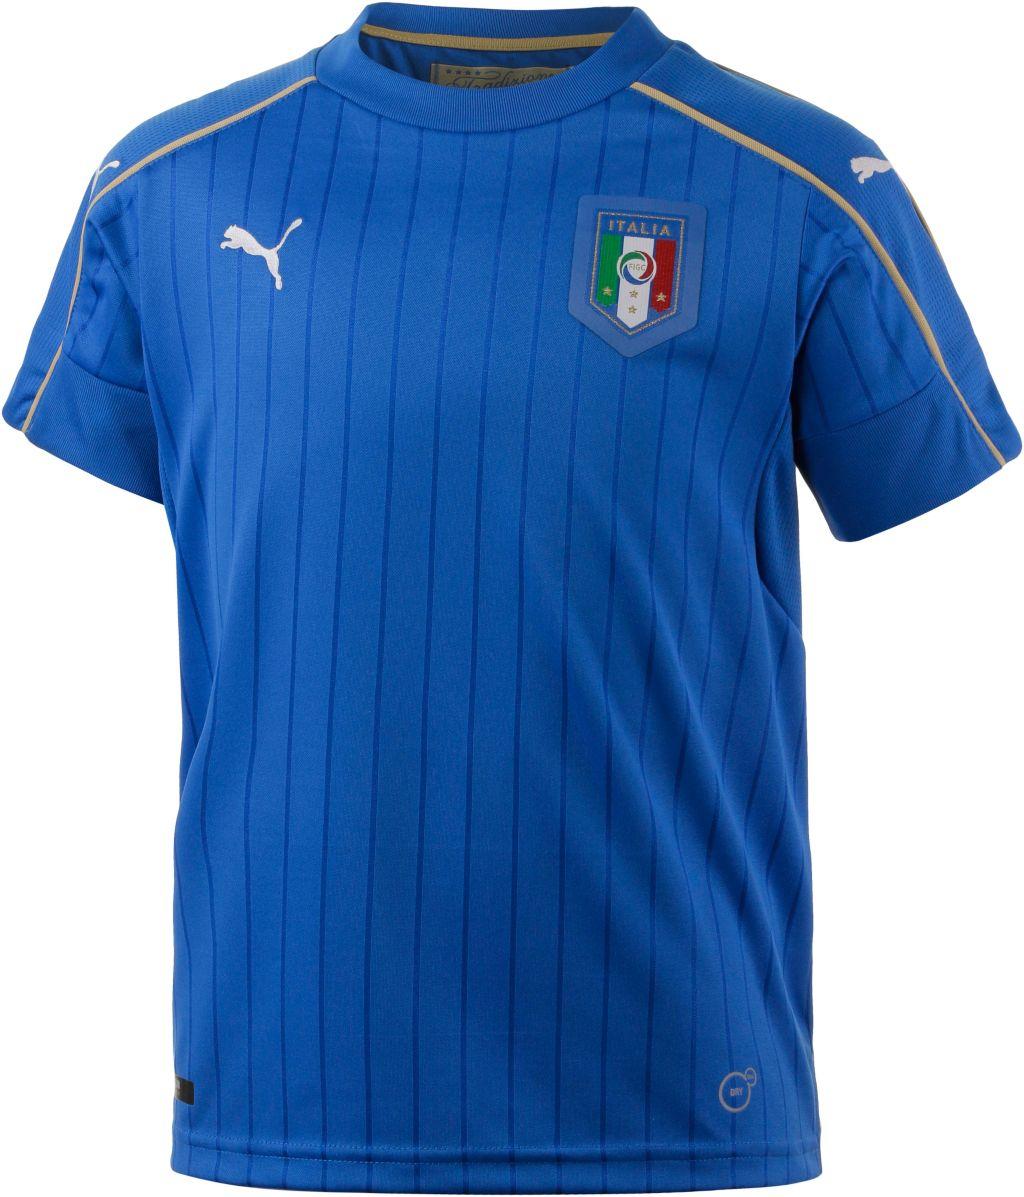 Italien EM 2016 Heim Fanshirt Kinder mehrfarbig, Größe 128